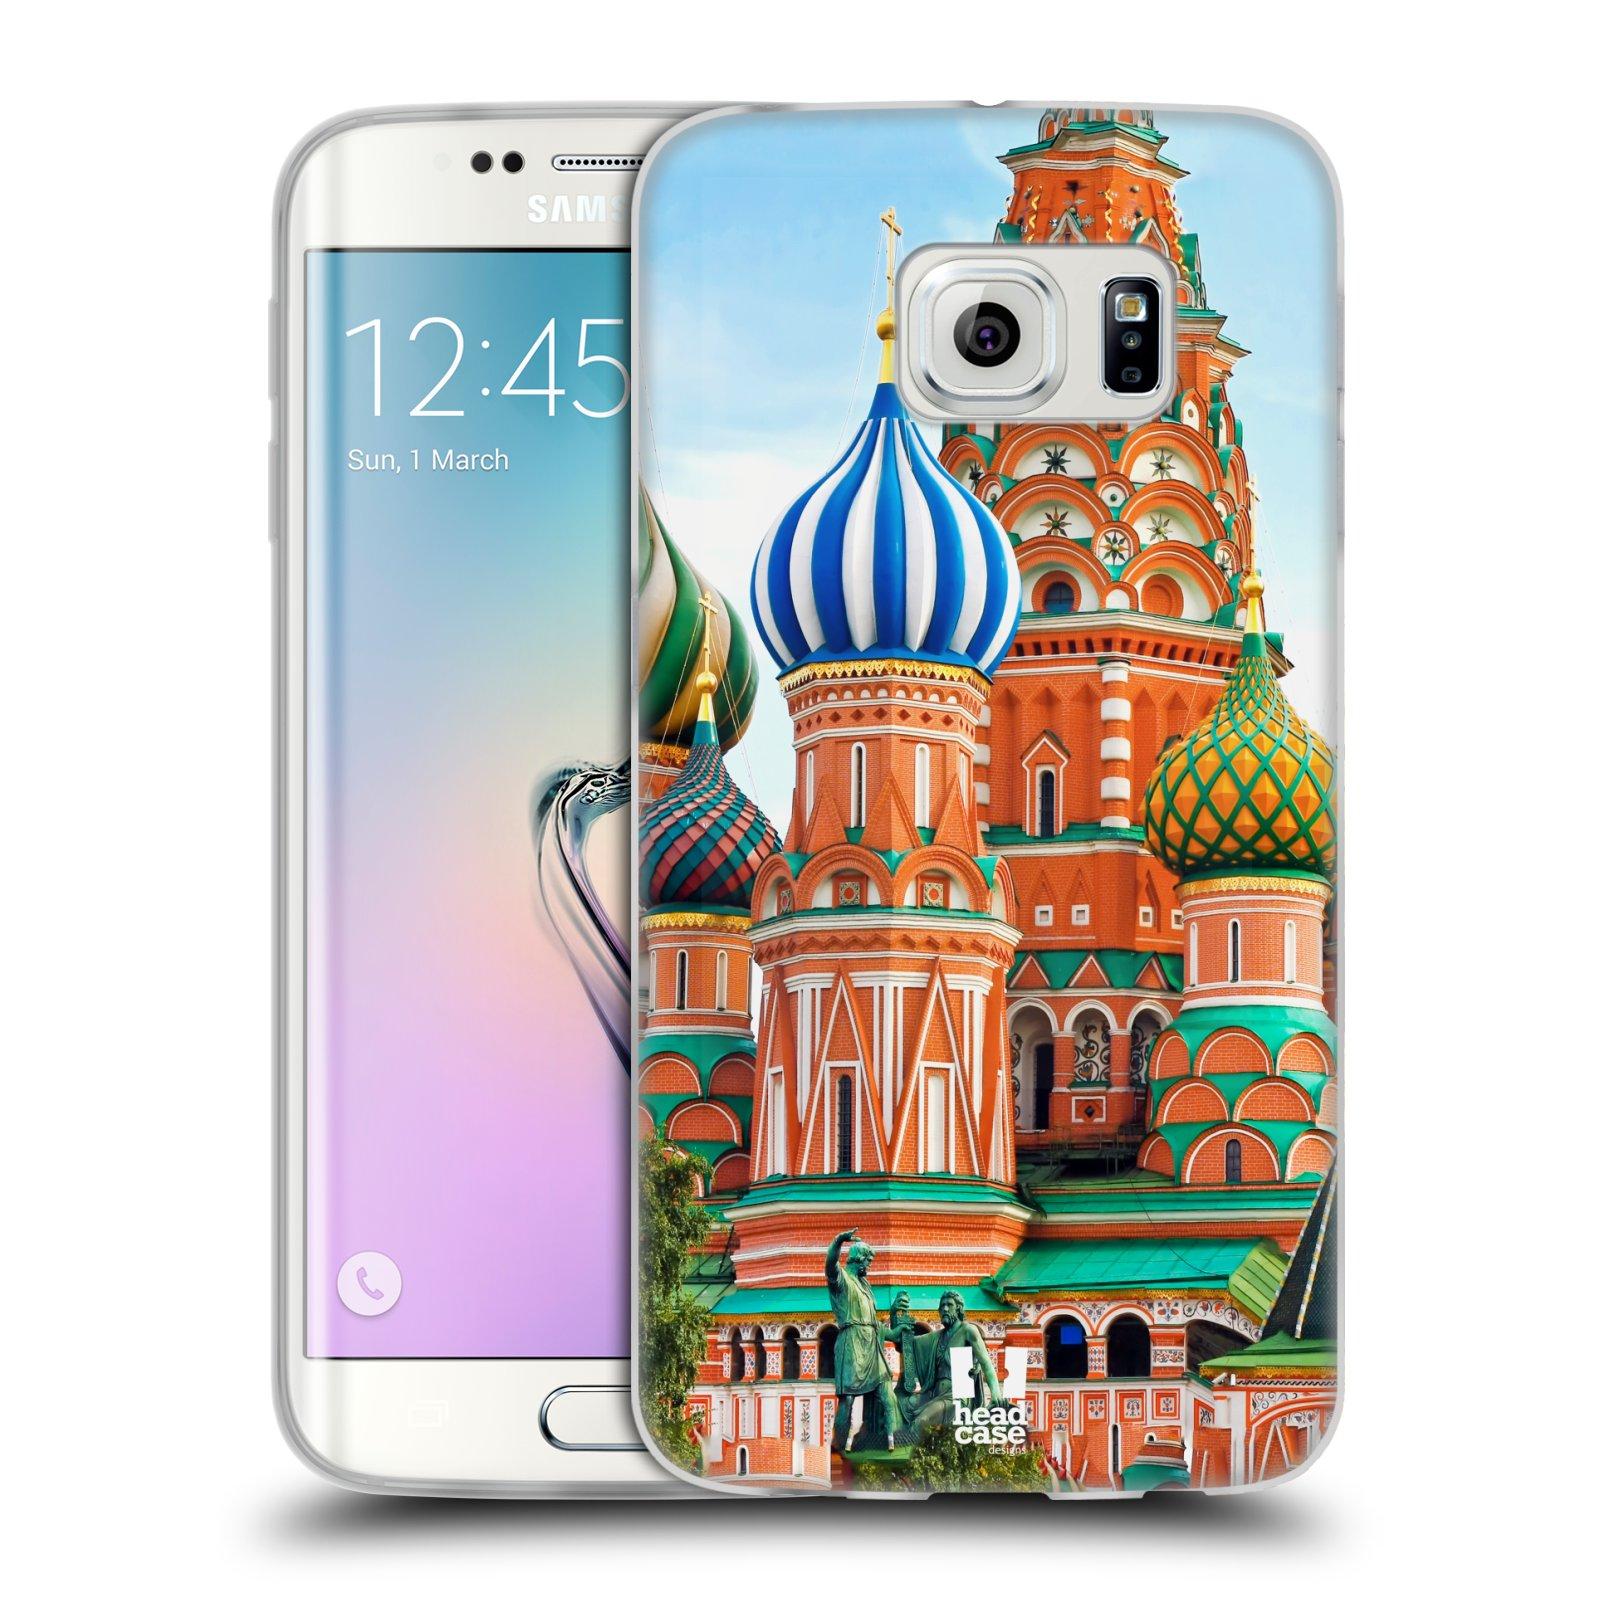 HEAD CASE silikonový obal na mobil Samsung Galaxy S6 EDGE vzor Města foto náměstí RUSKO,MOSKVA, RUDÉ NÁMĚSTÍ